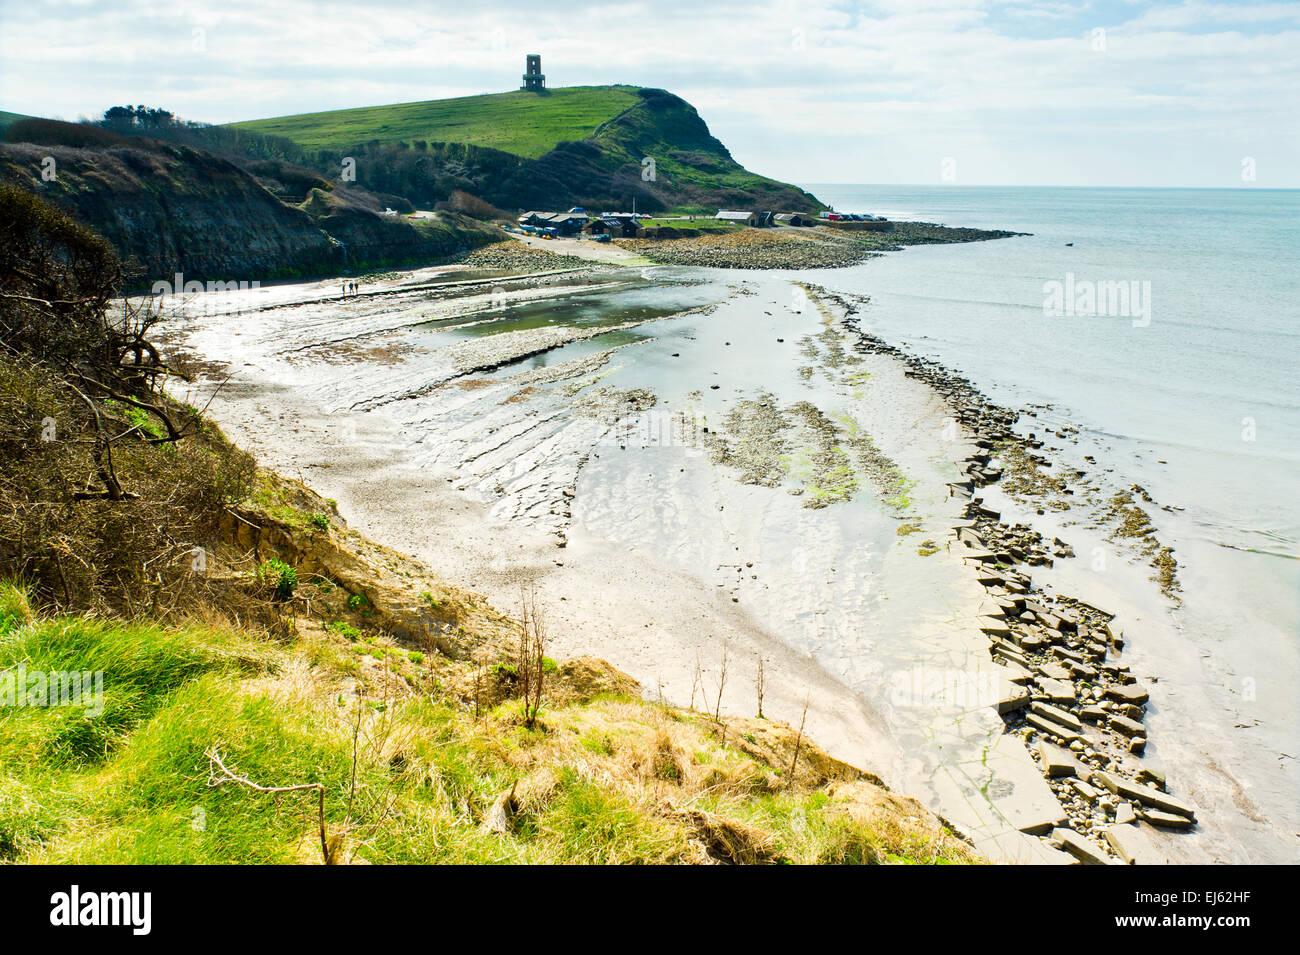 Beach at Kimmeridge Bay, Dorset, England - Stock Image